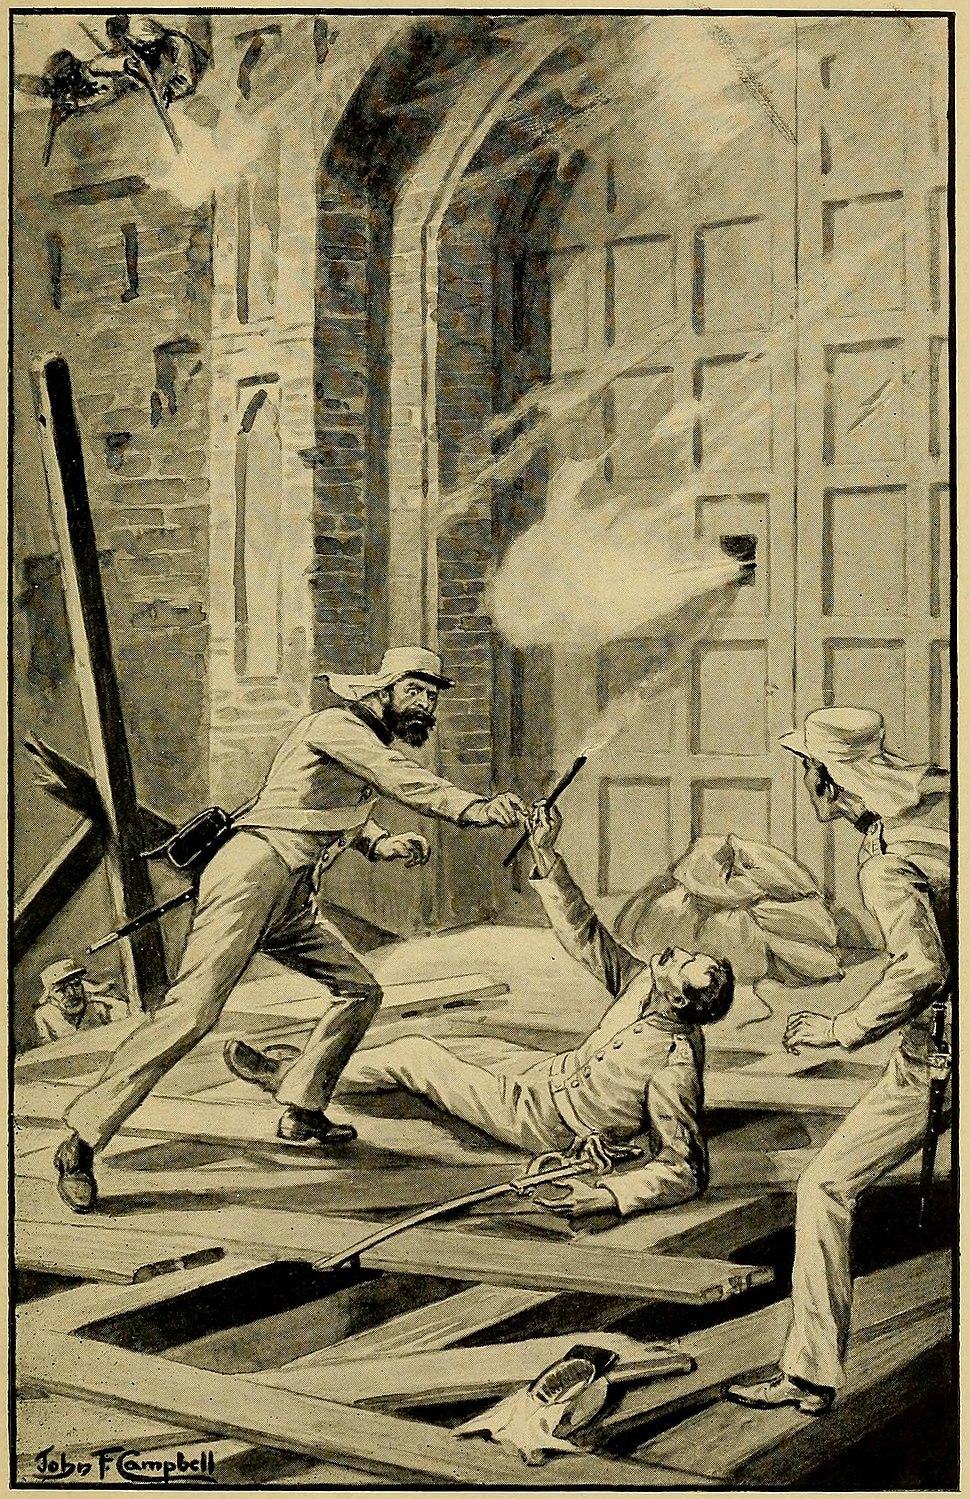 Blowing of Kashmir by Sergeant Carmichael